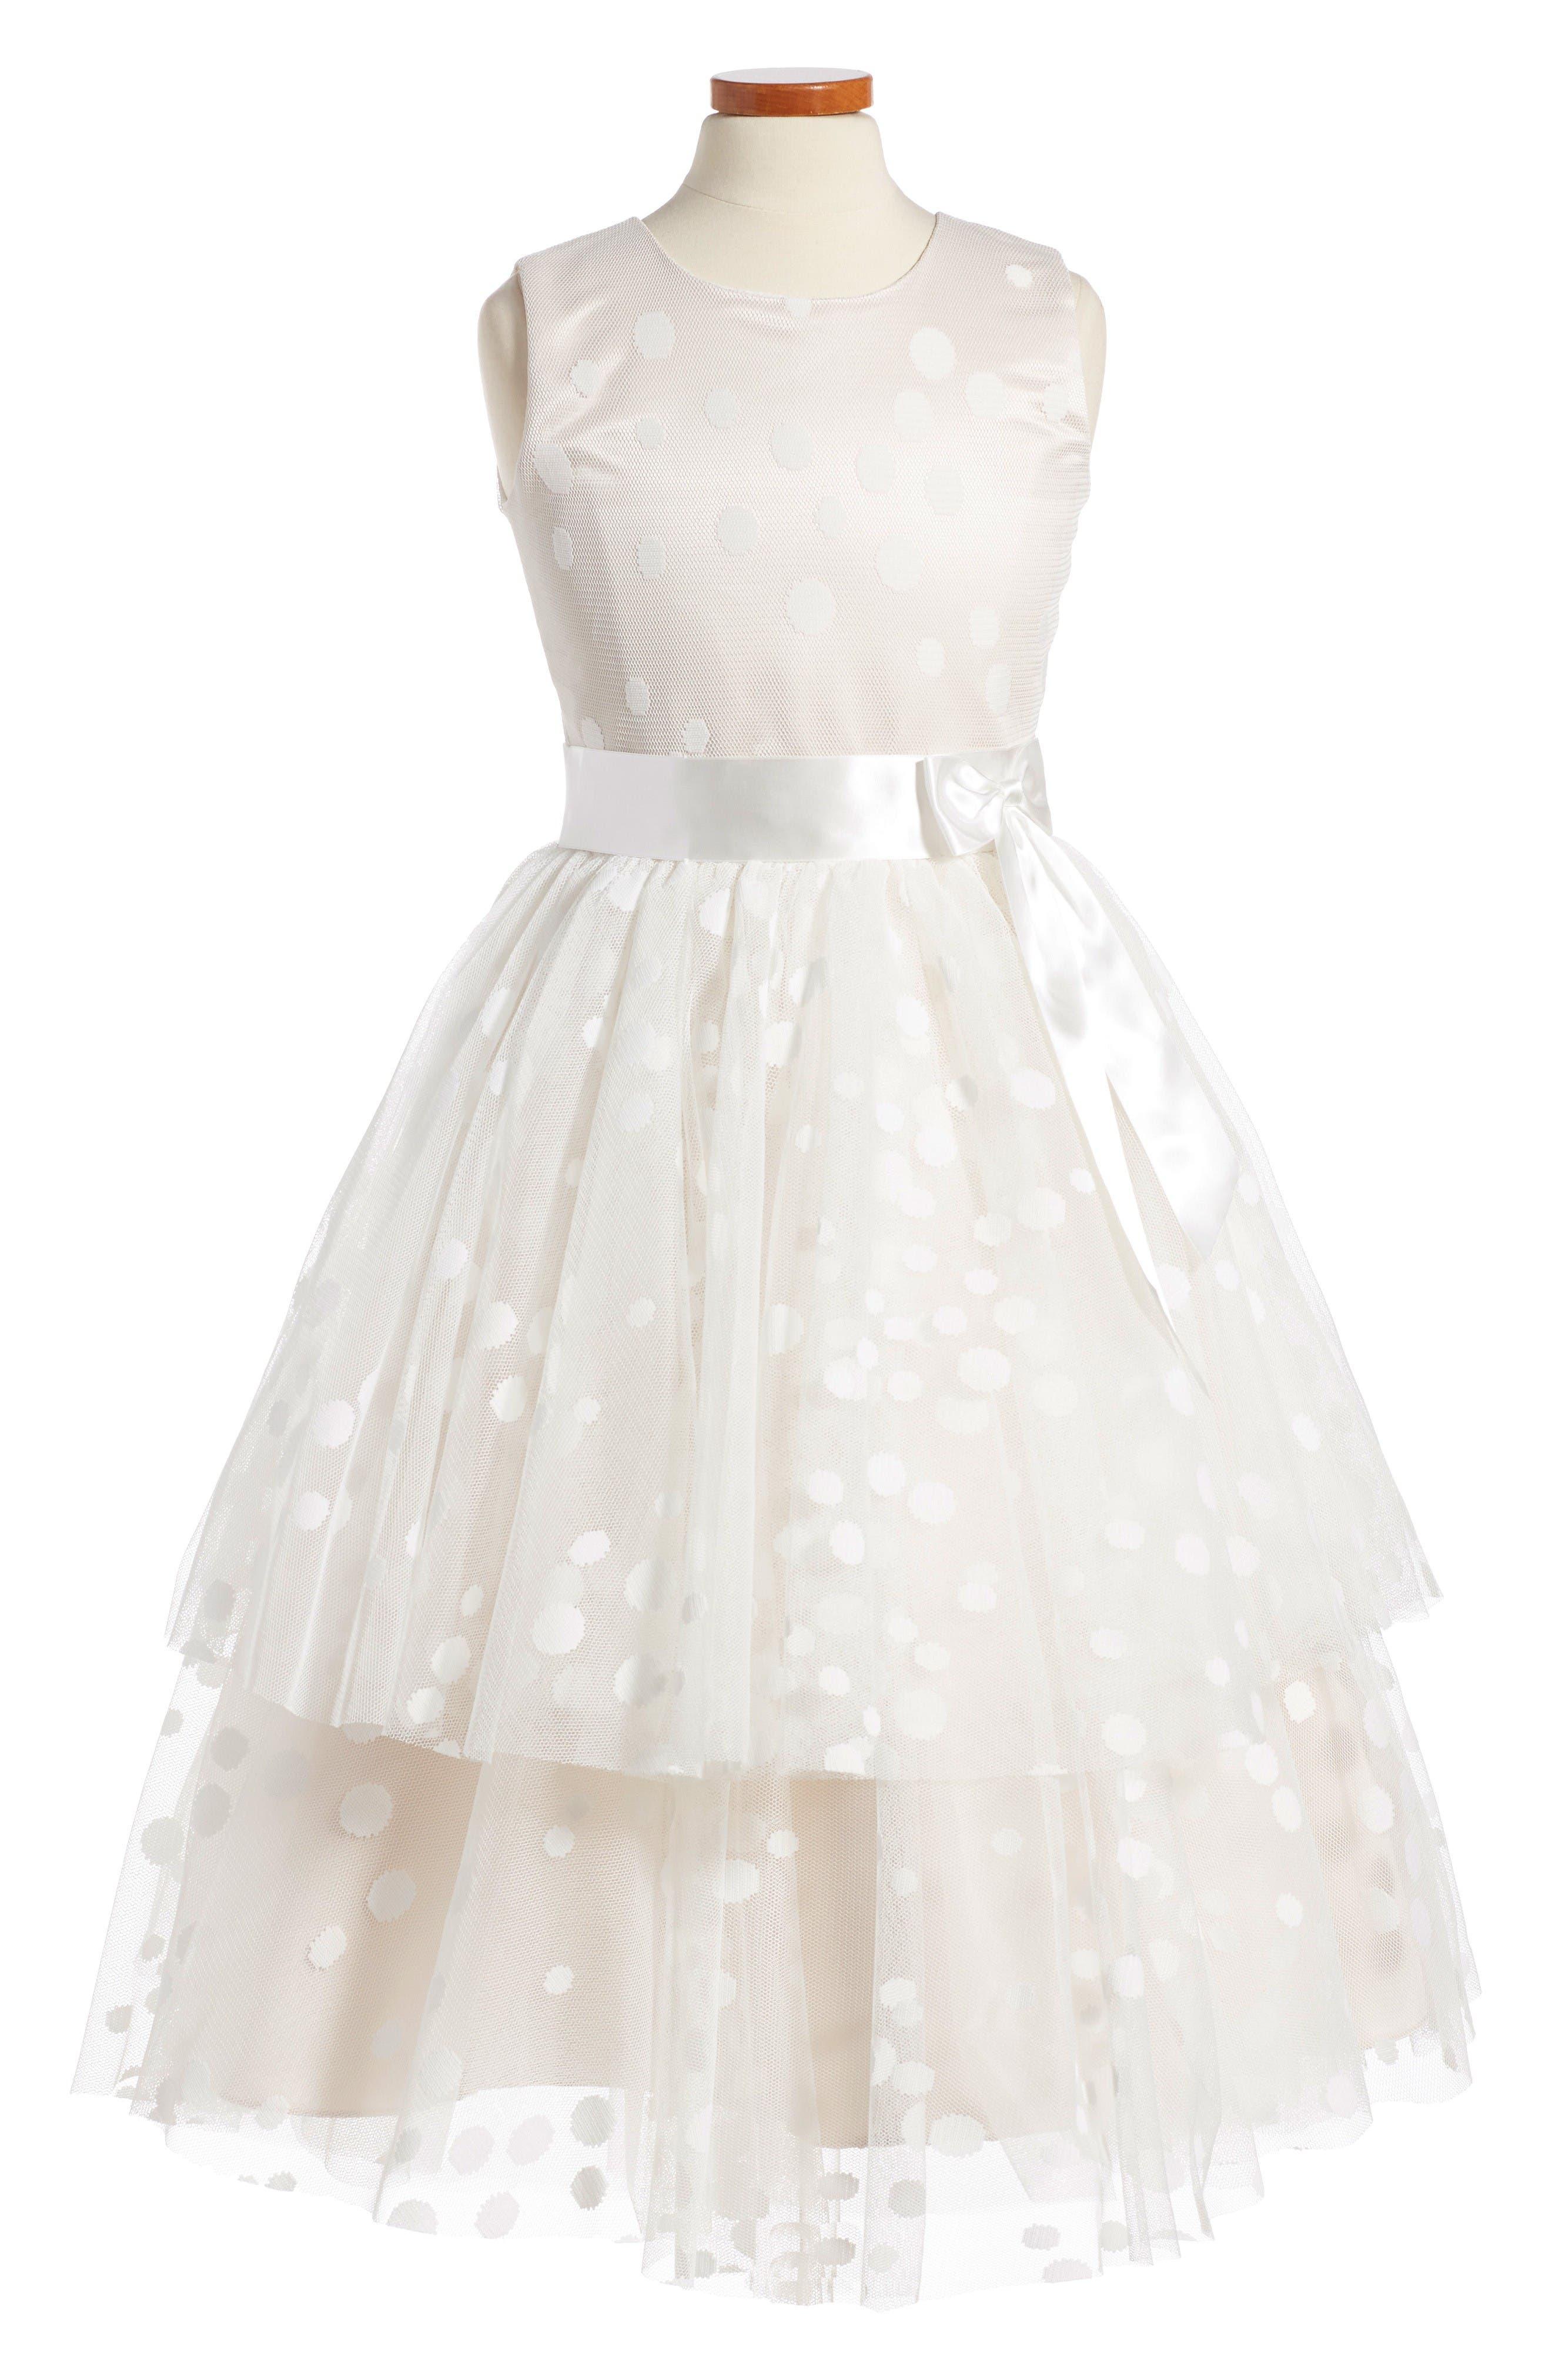 Joan Calabrese for Mon Cheri Double Layer Chiffon Dress (Toddler Girls, Little Girls & Big Girls)